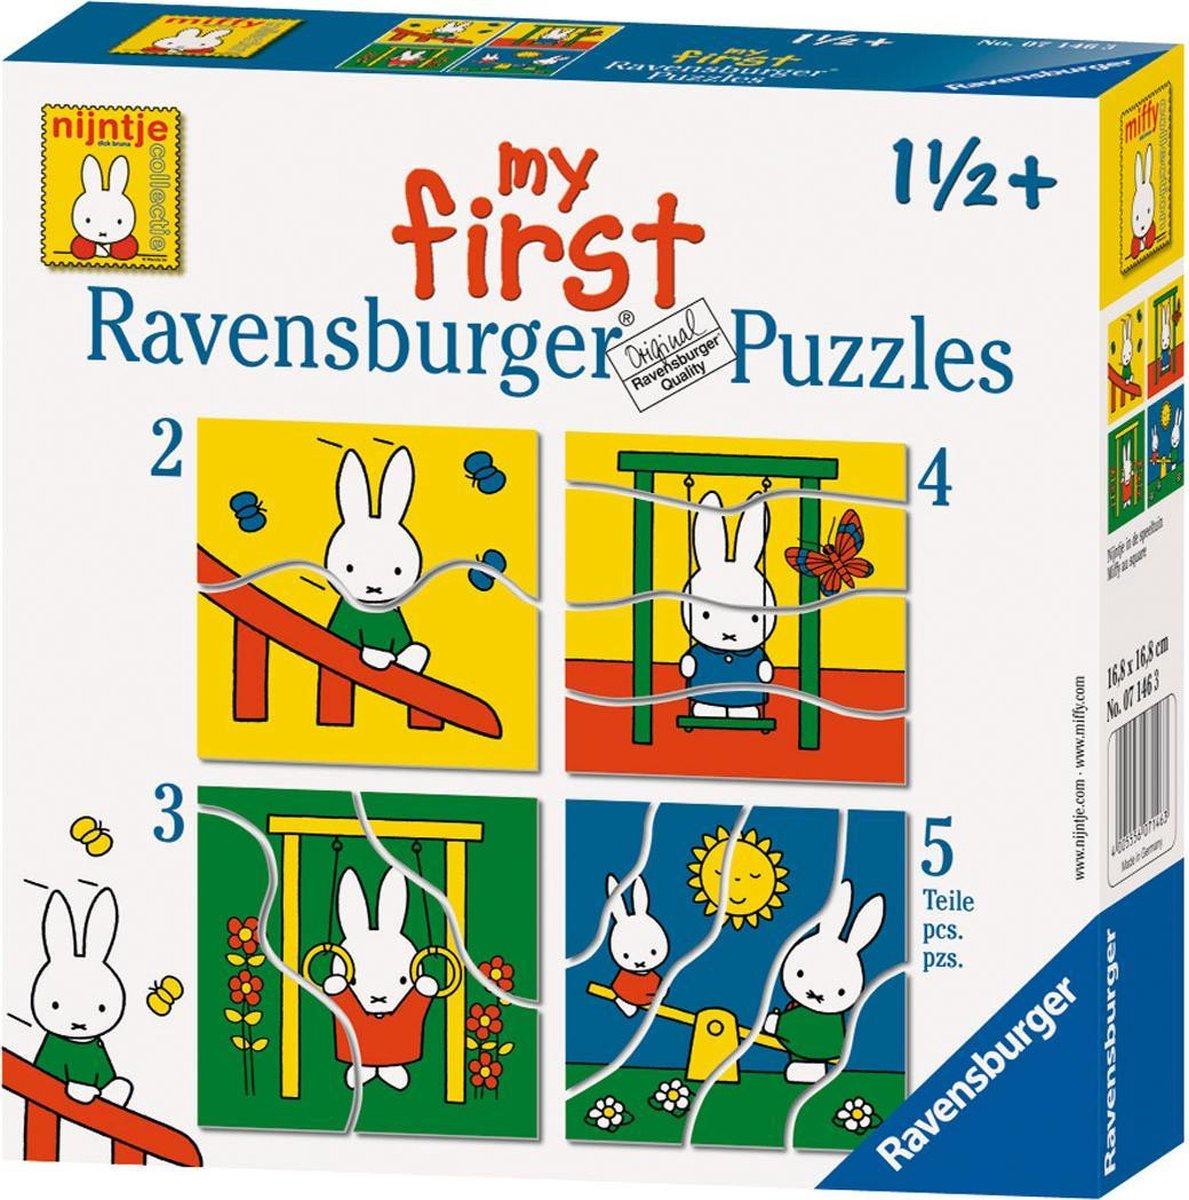 Ravensburger nijntje My first puzzels -2+3+4+5 stukjes - kinderpuzzel